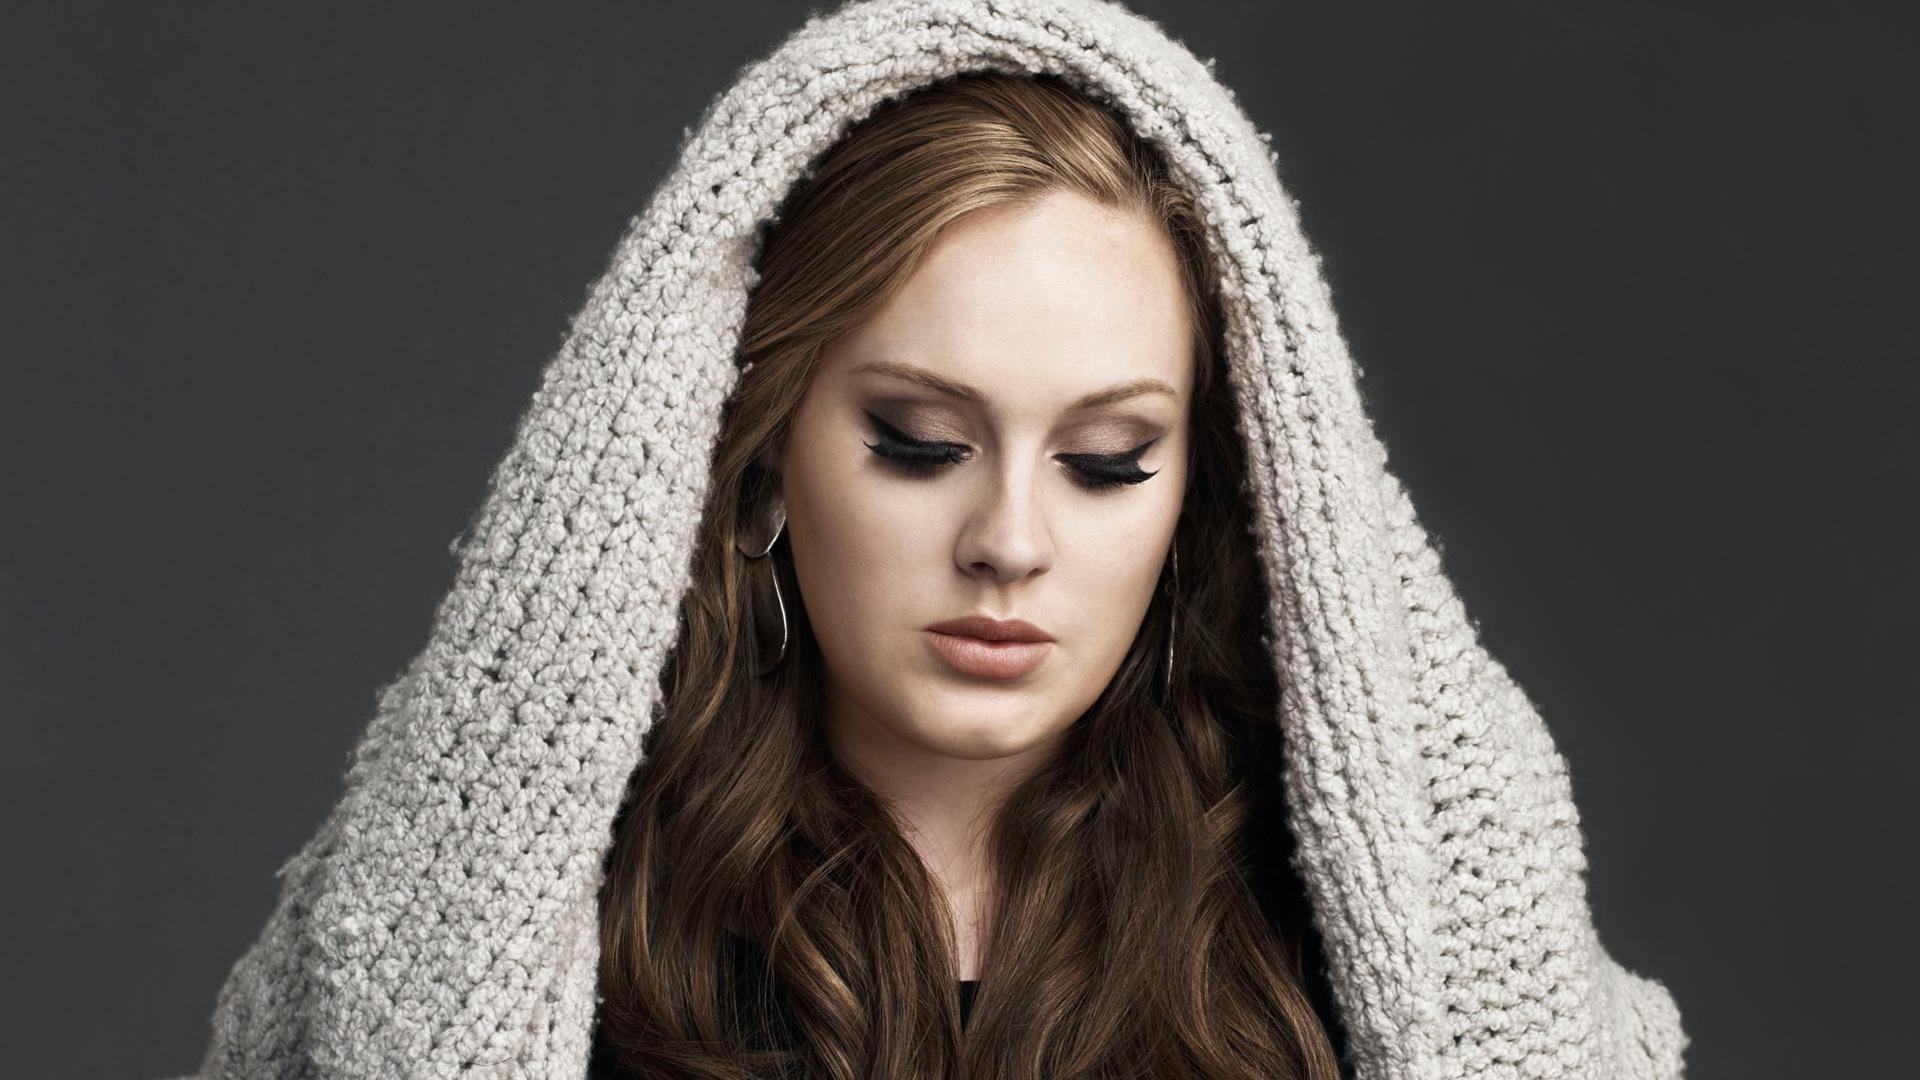 43 Adele HD Wallpapers